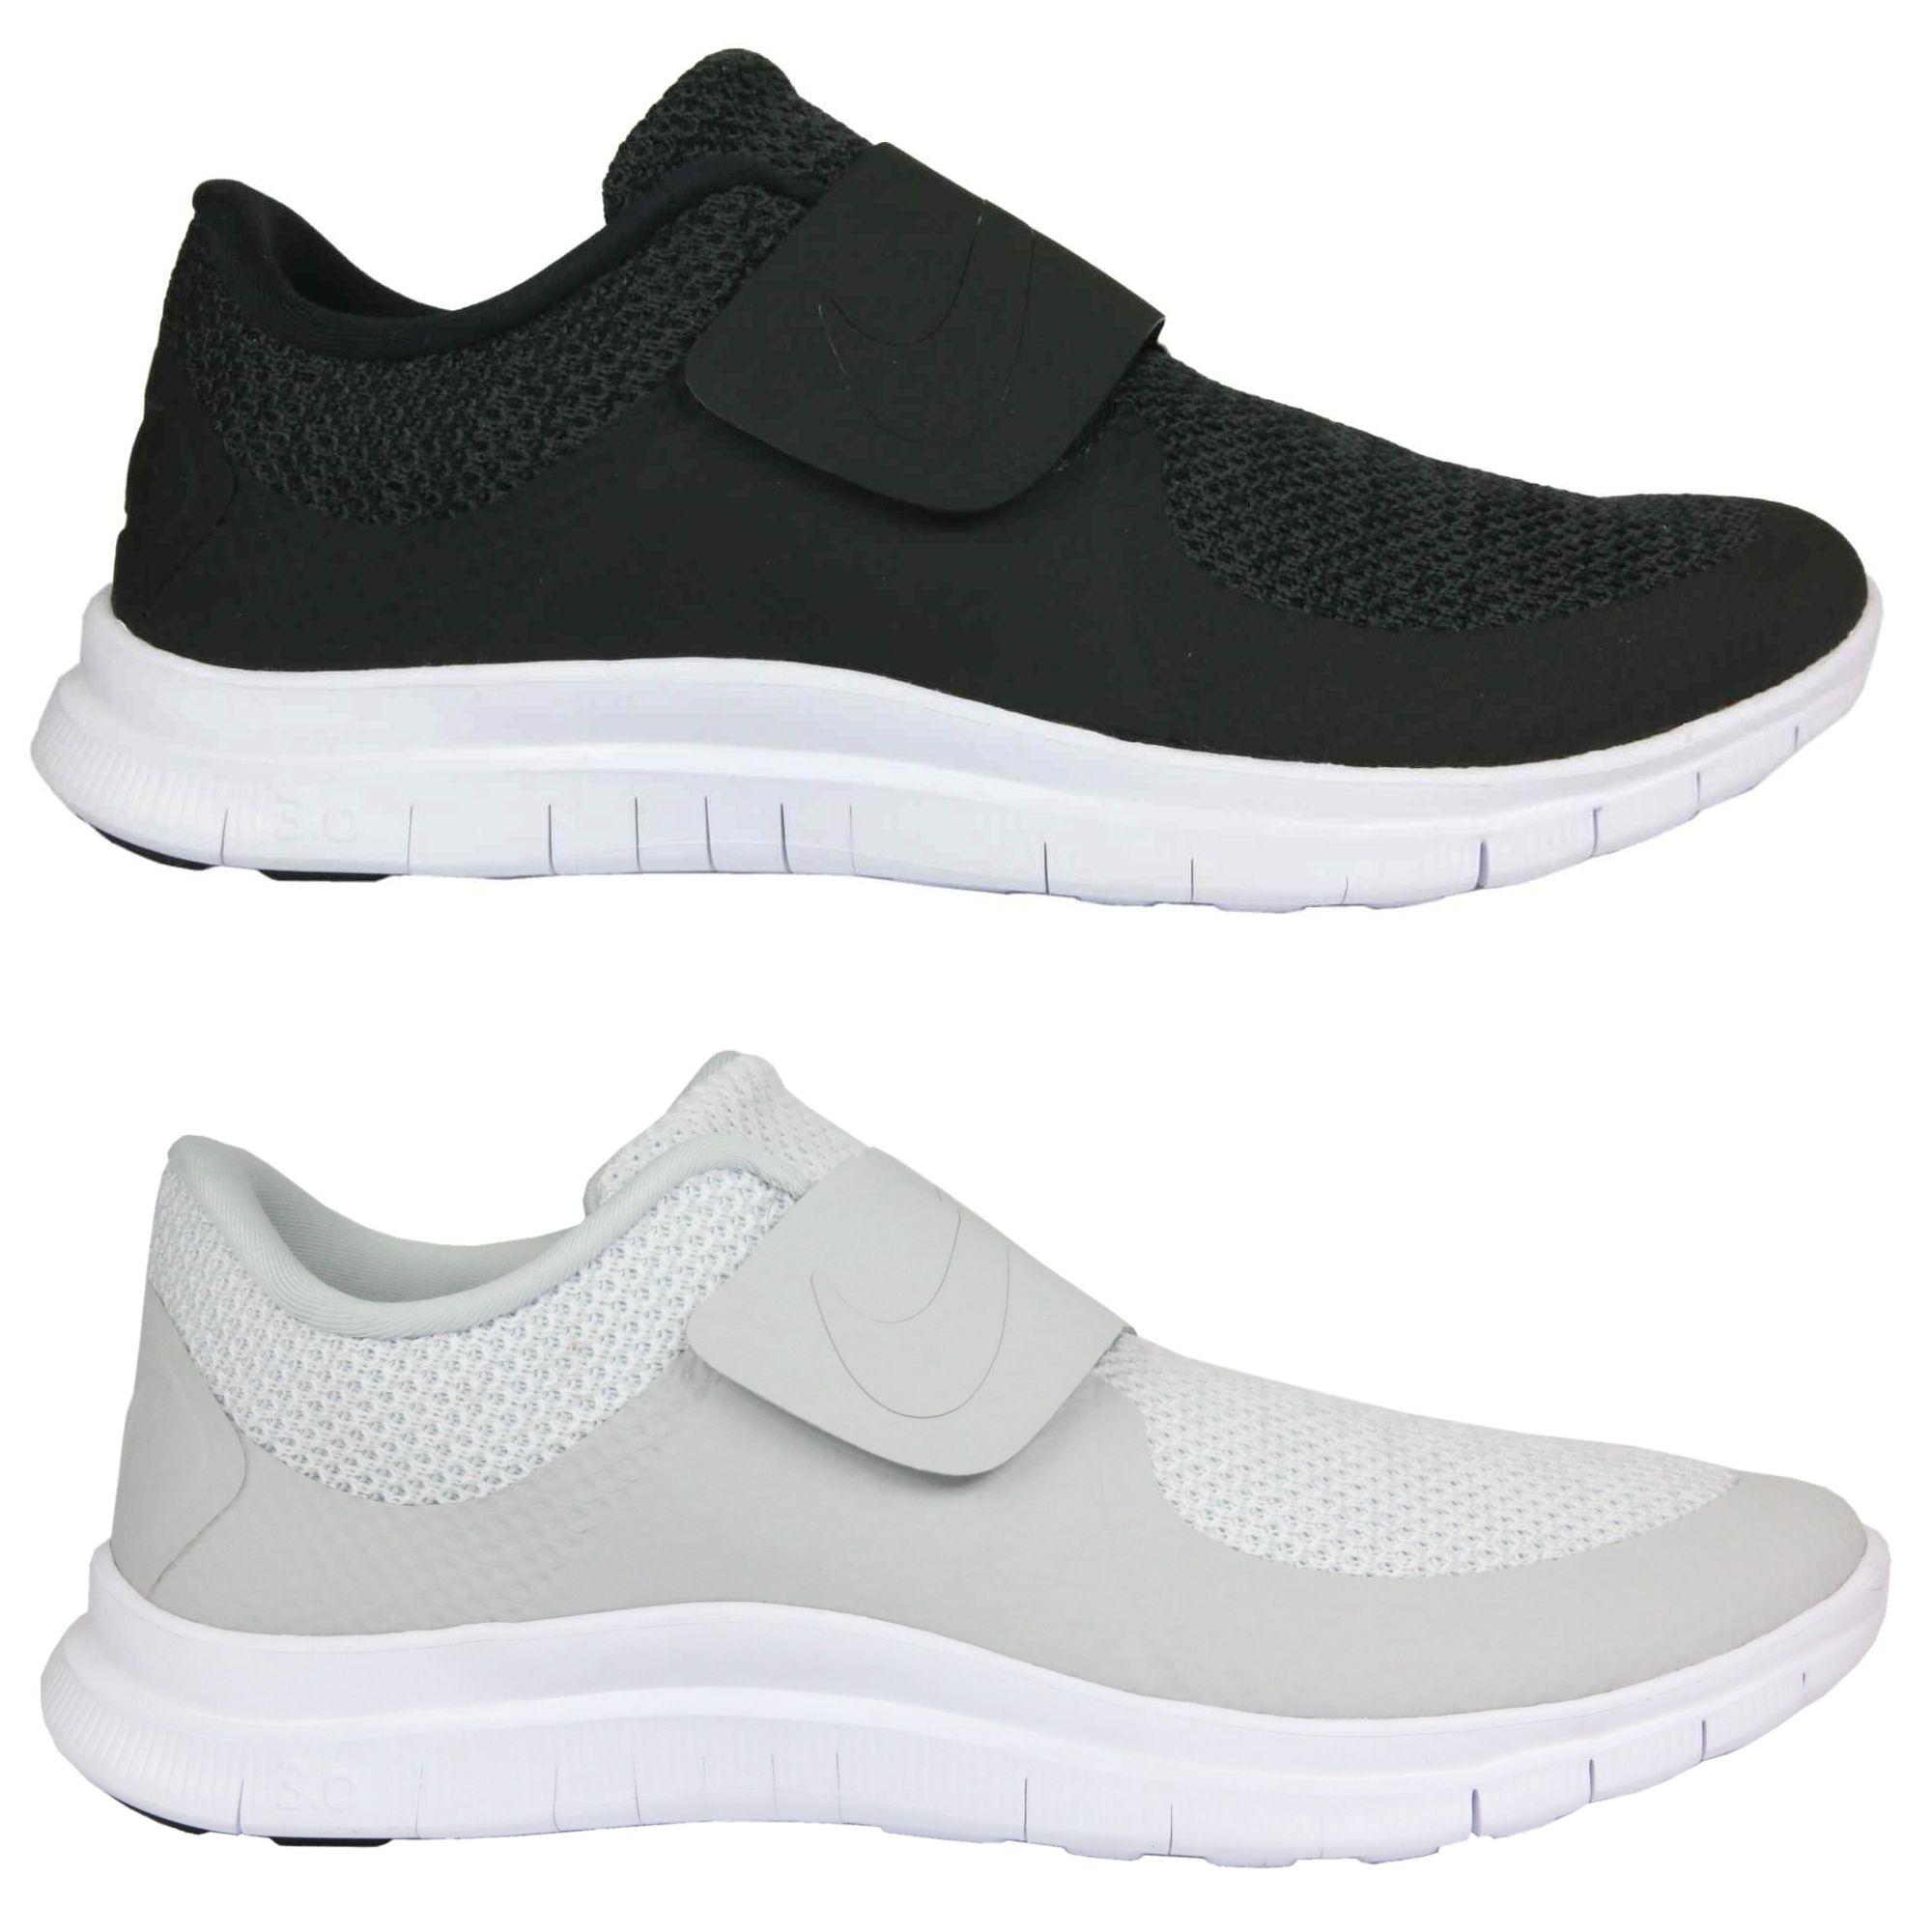 nike free socfly schuhe turnschuhe sneaker klettverschluss herren 724851 ebay. Black Bedroom Furniture Sets. Home Design Ideas